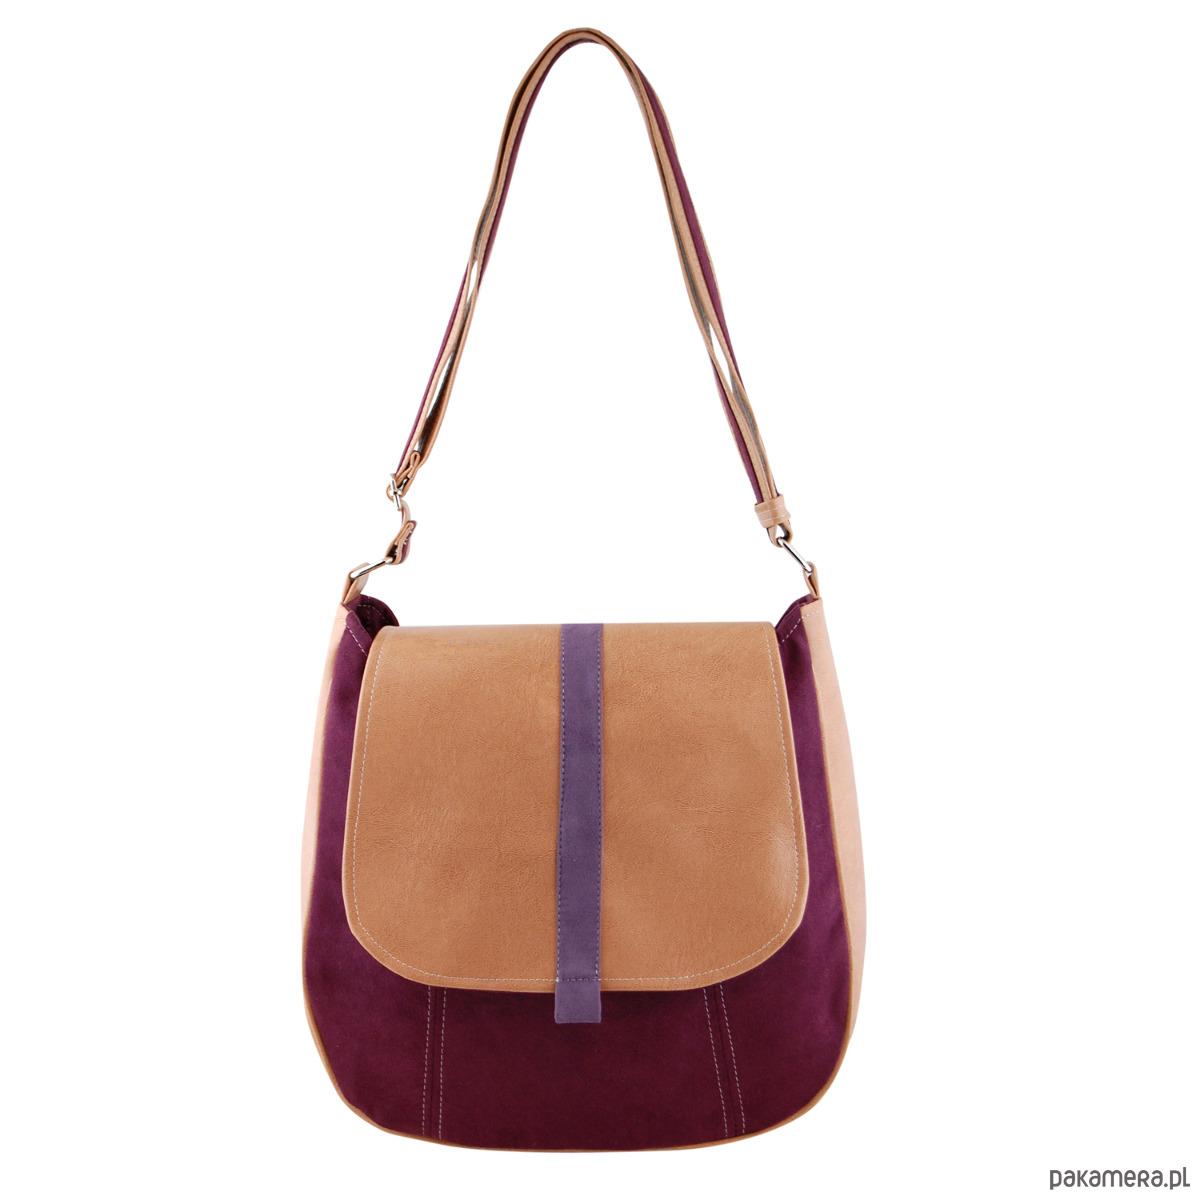 c551089708573 SASHKA - torebka na ramię - beż i bordo - torby na ramię - damskie -  Pakamera.pl